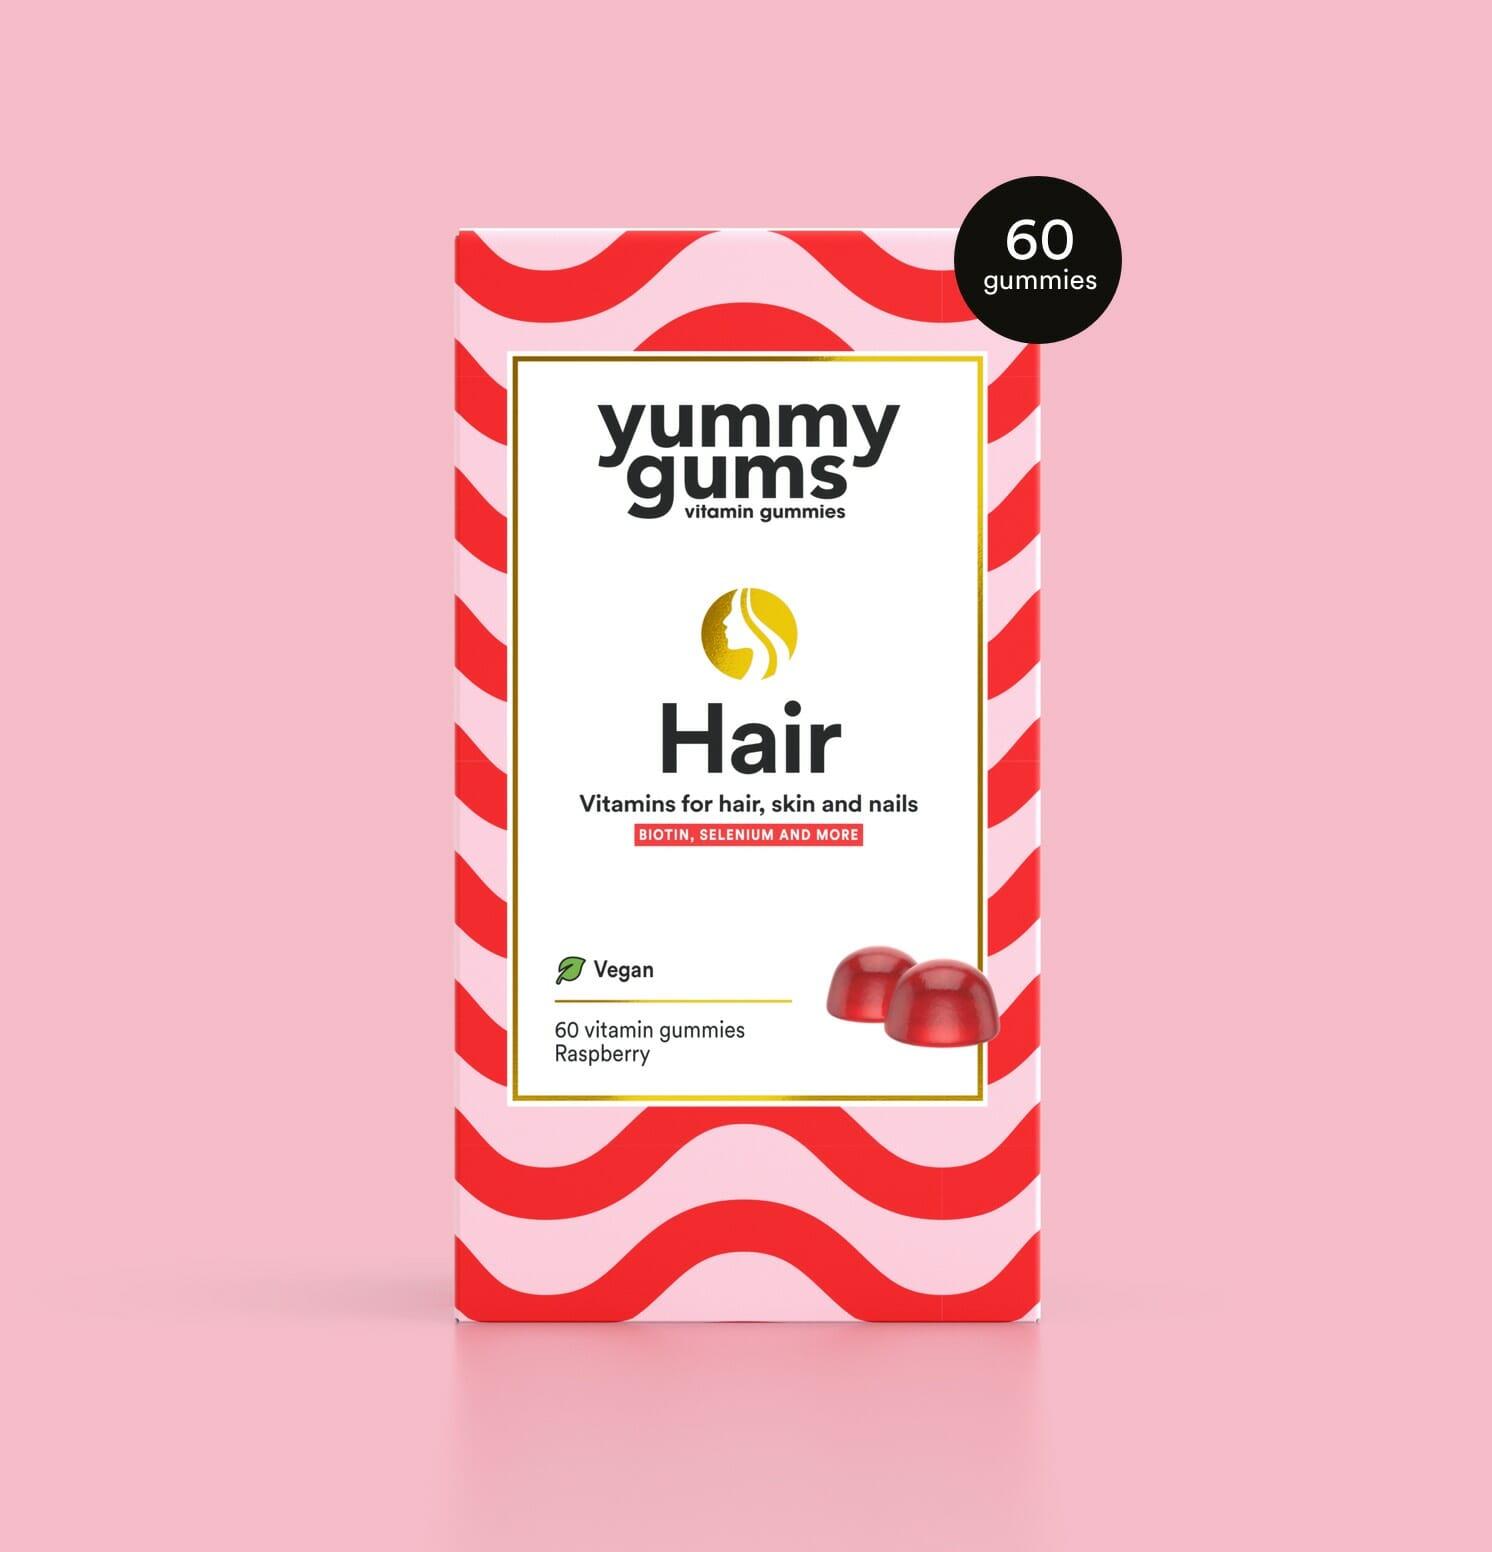 Vitamins for hair - Hair vitamins - Yummygums Hair & Beauty